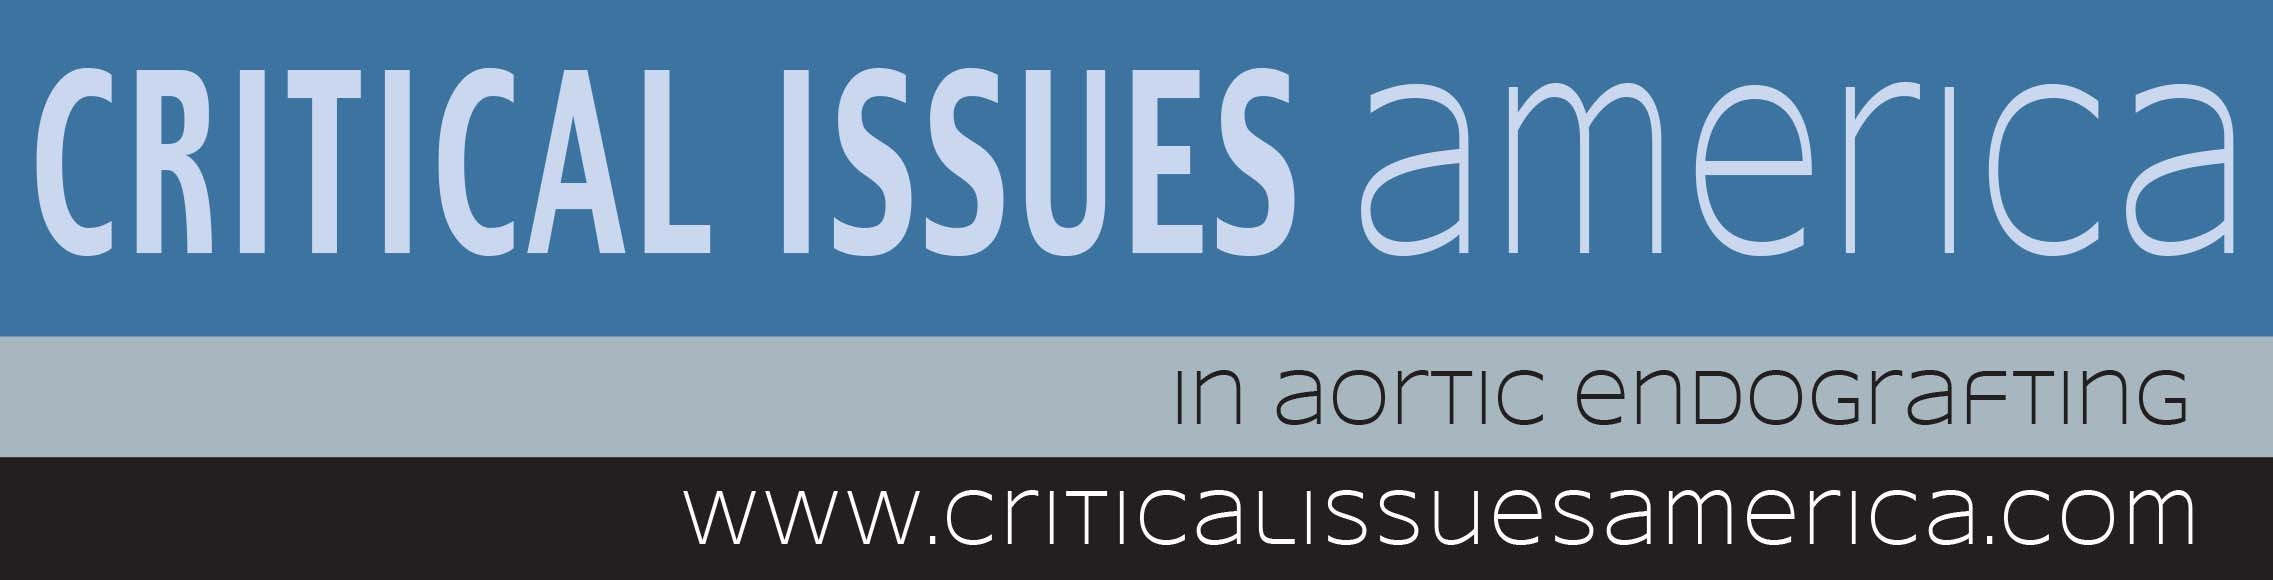 2019 Critical Issues America